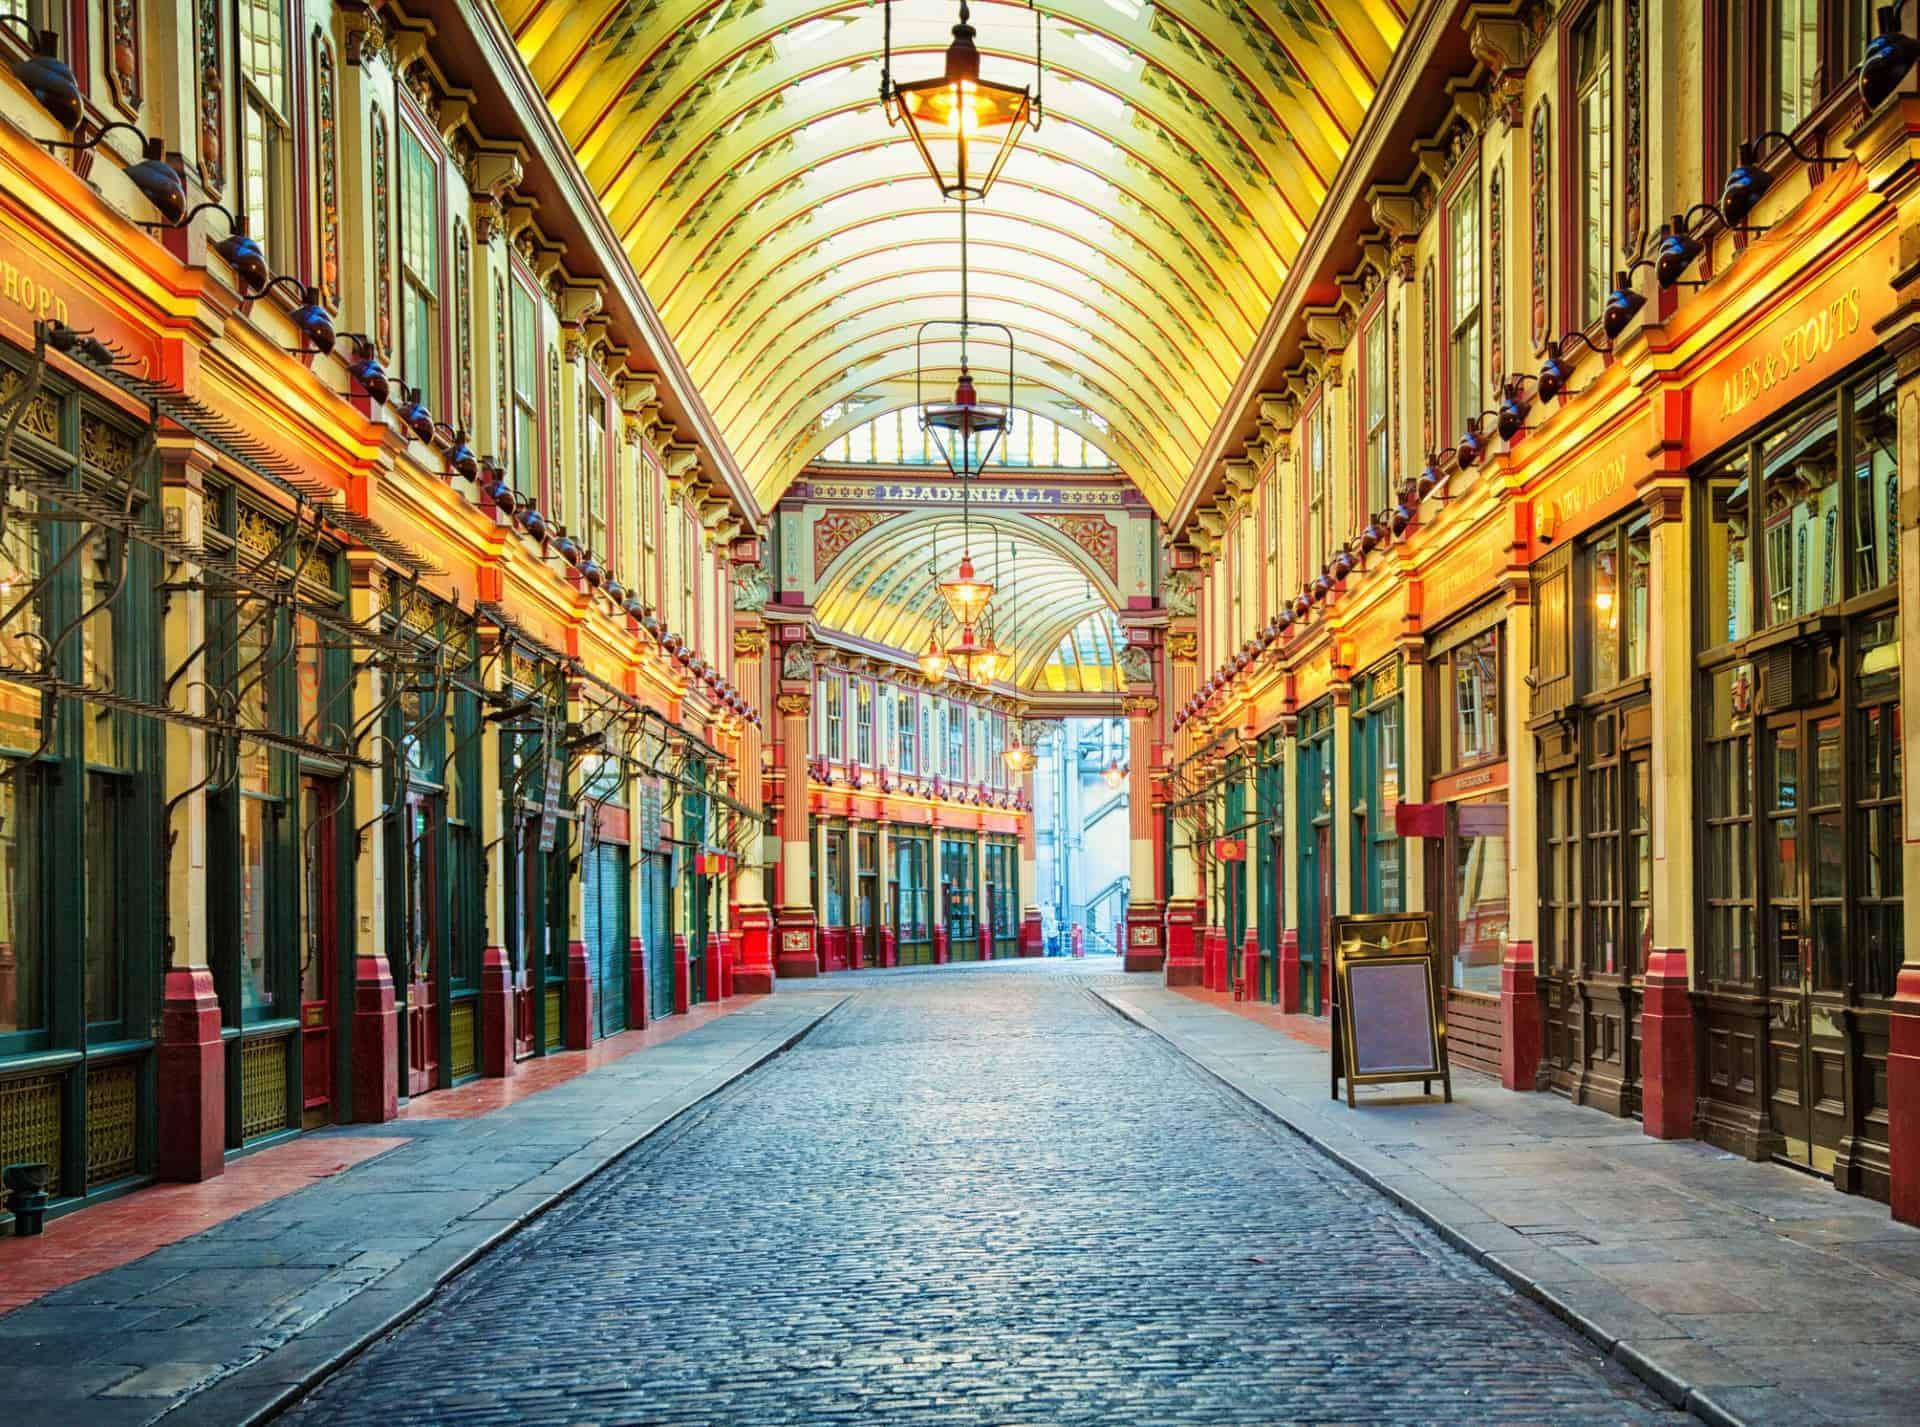 Queen Victoria's Great Britain, Leadenhall arcade